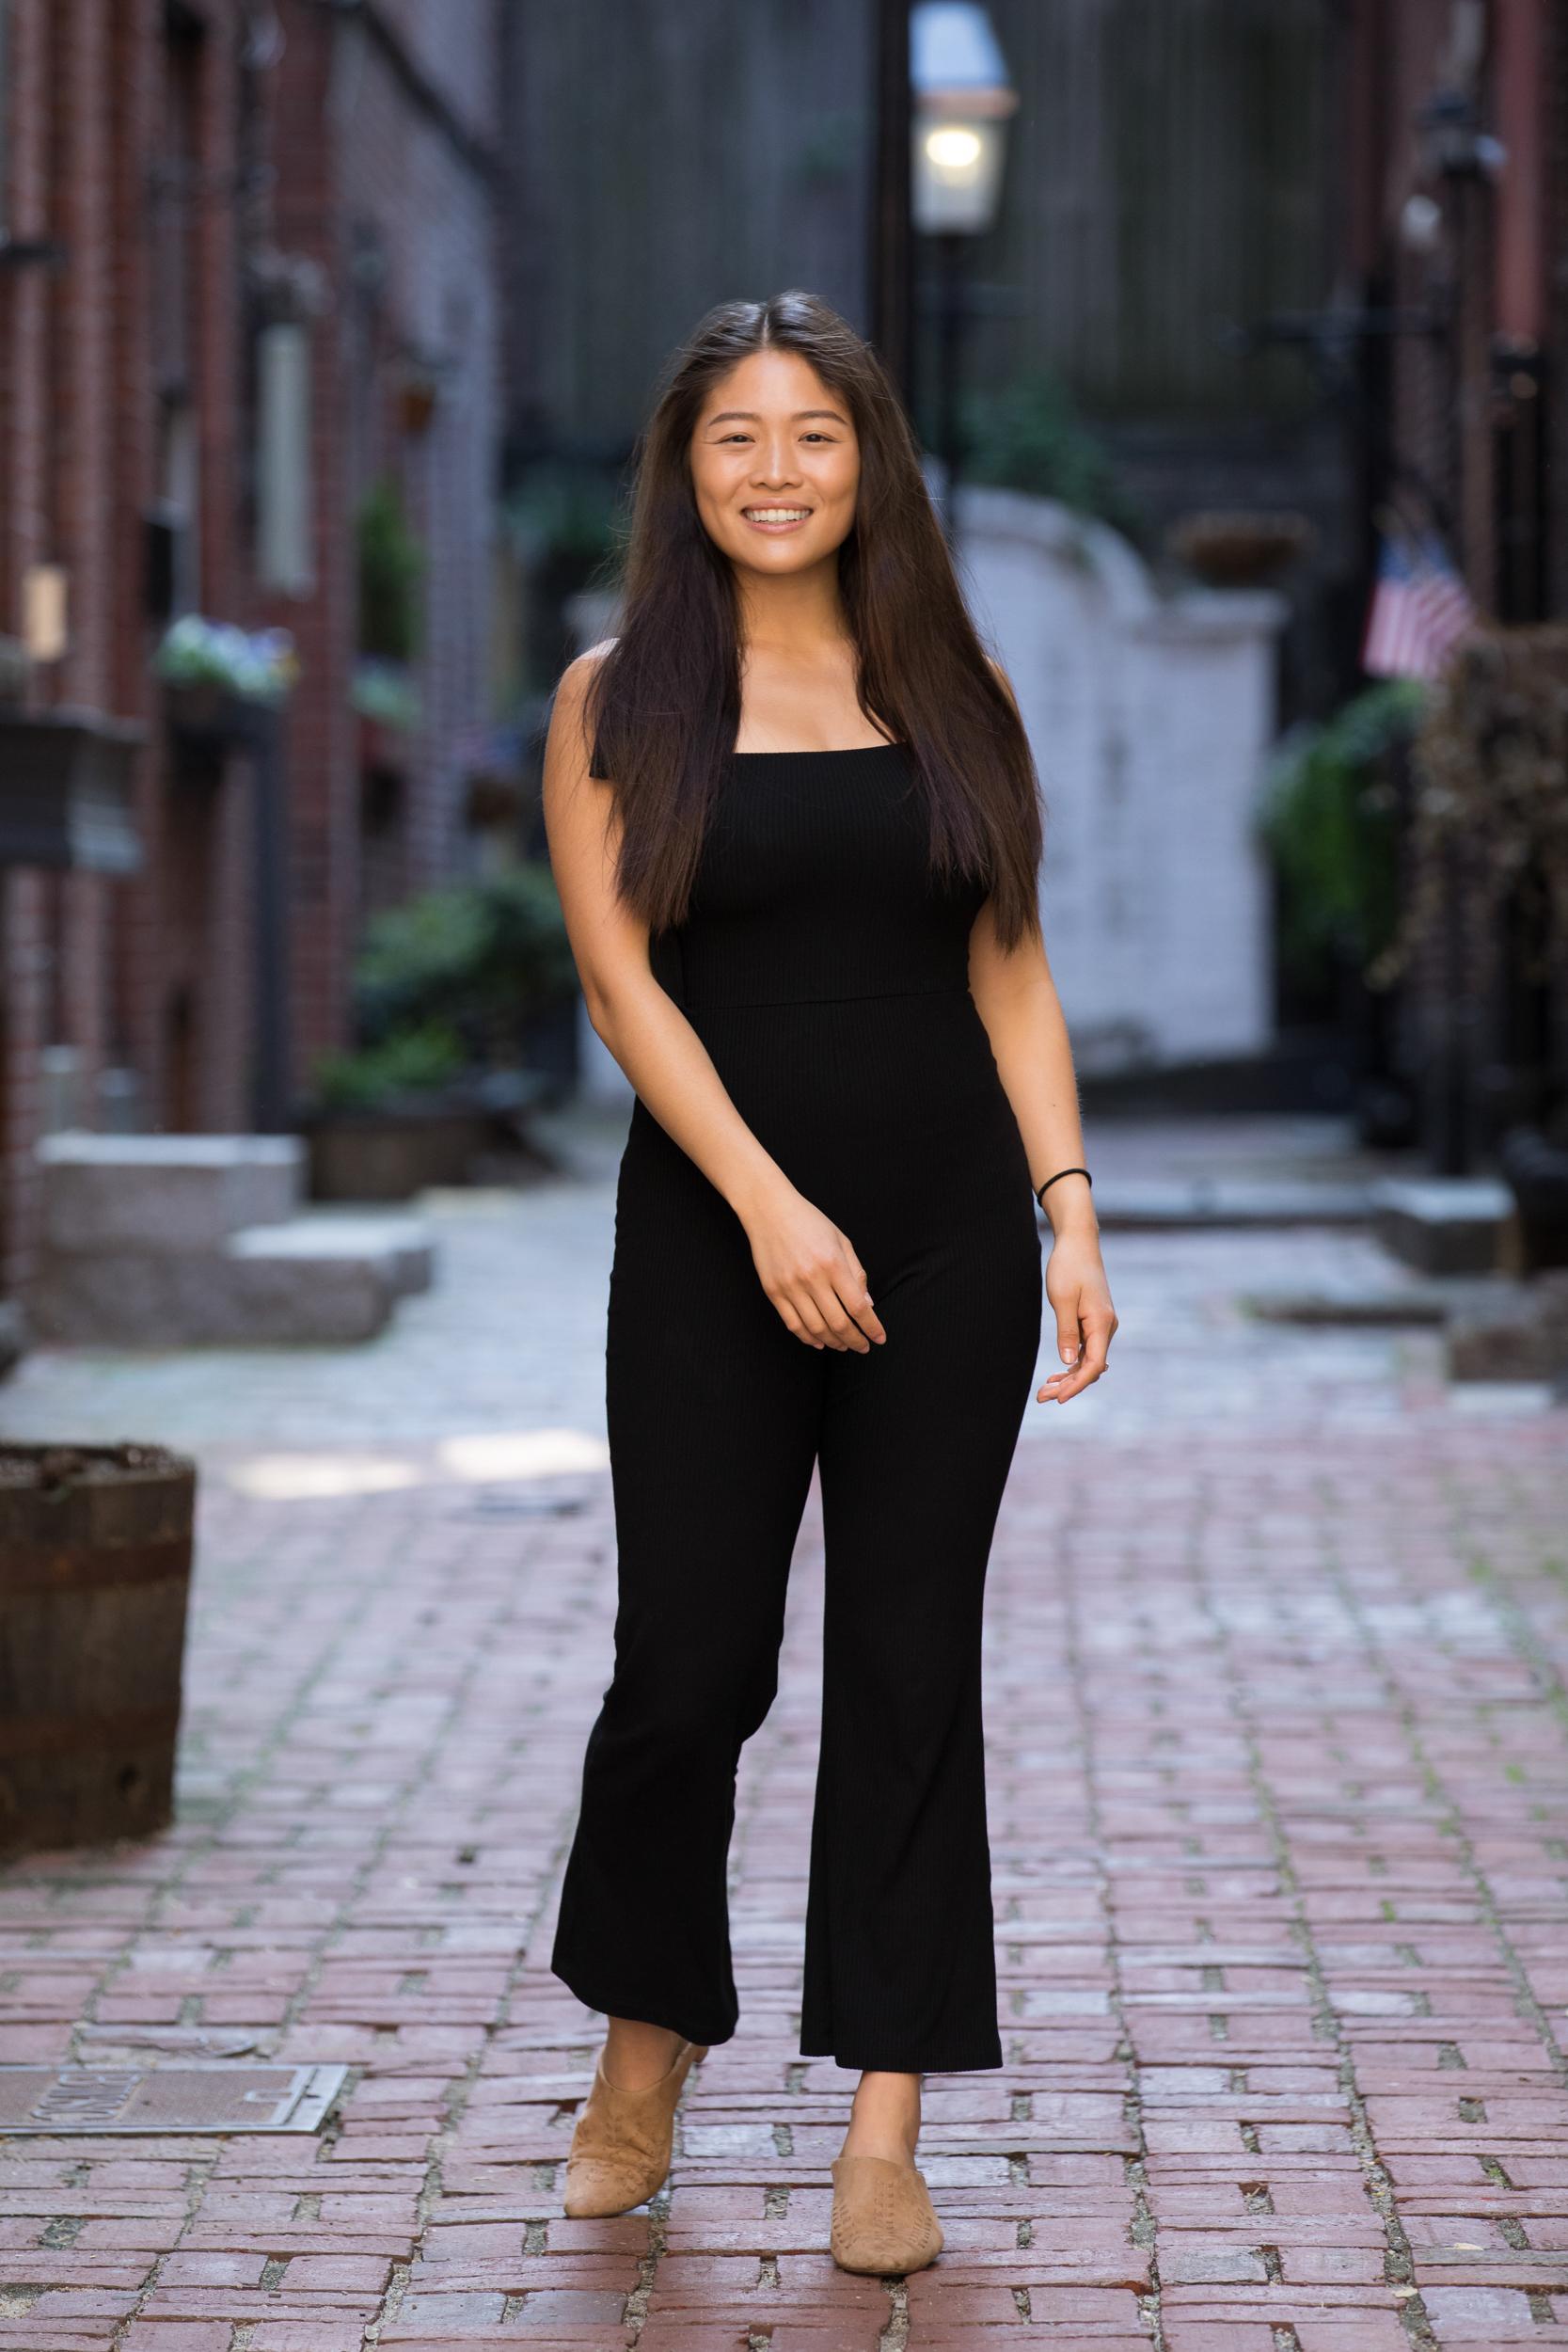 Personal-Branding-Photoshoot-with-Christie-Wang-04.jpg